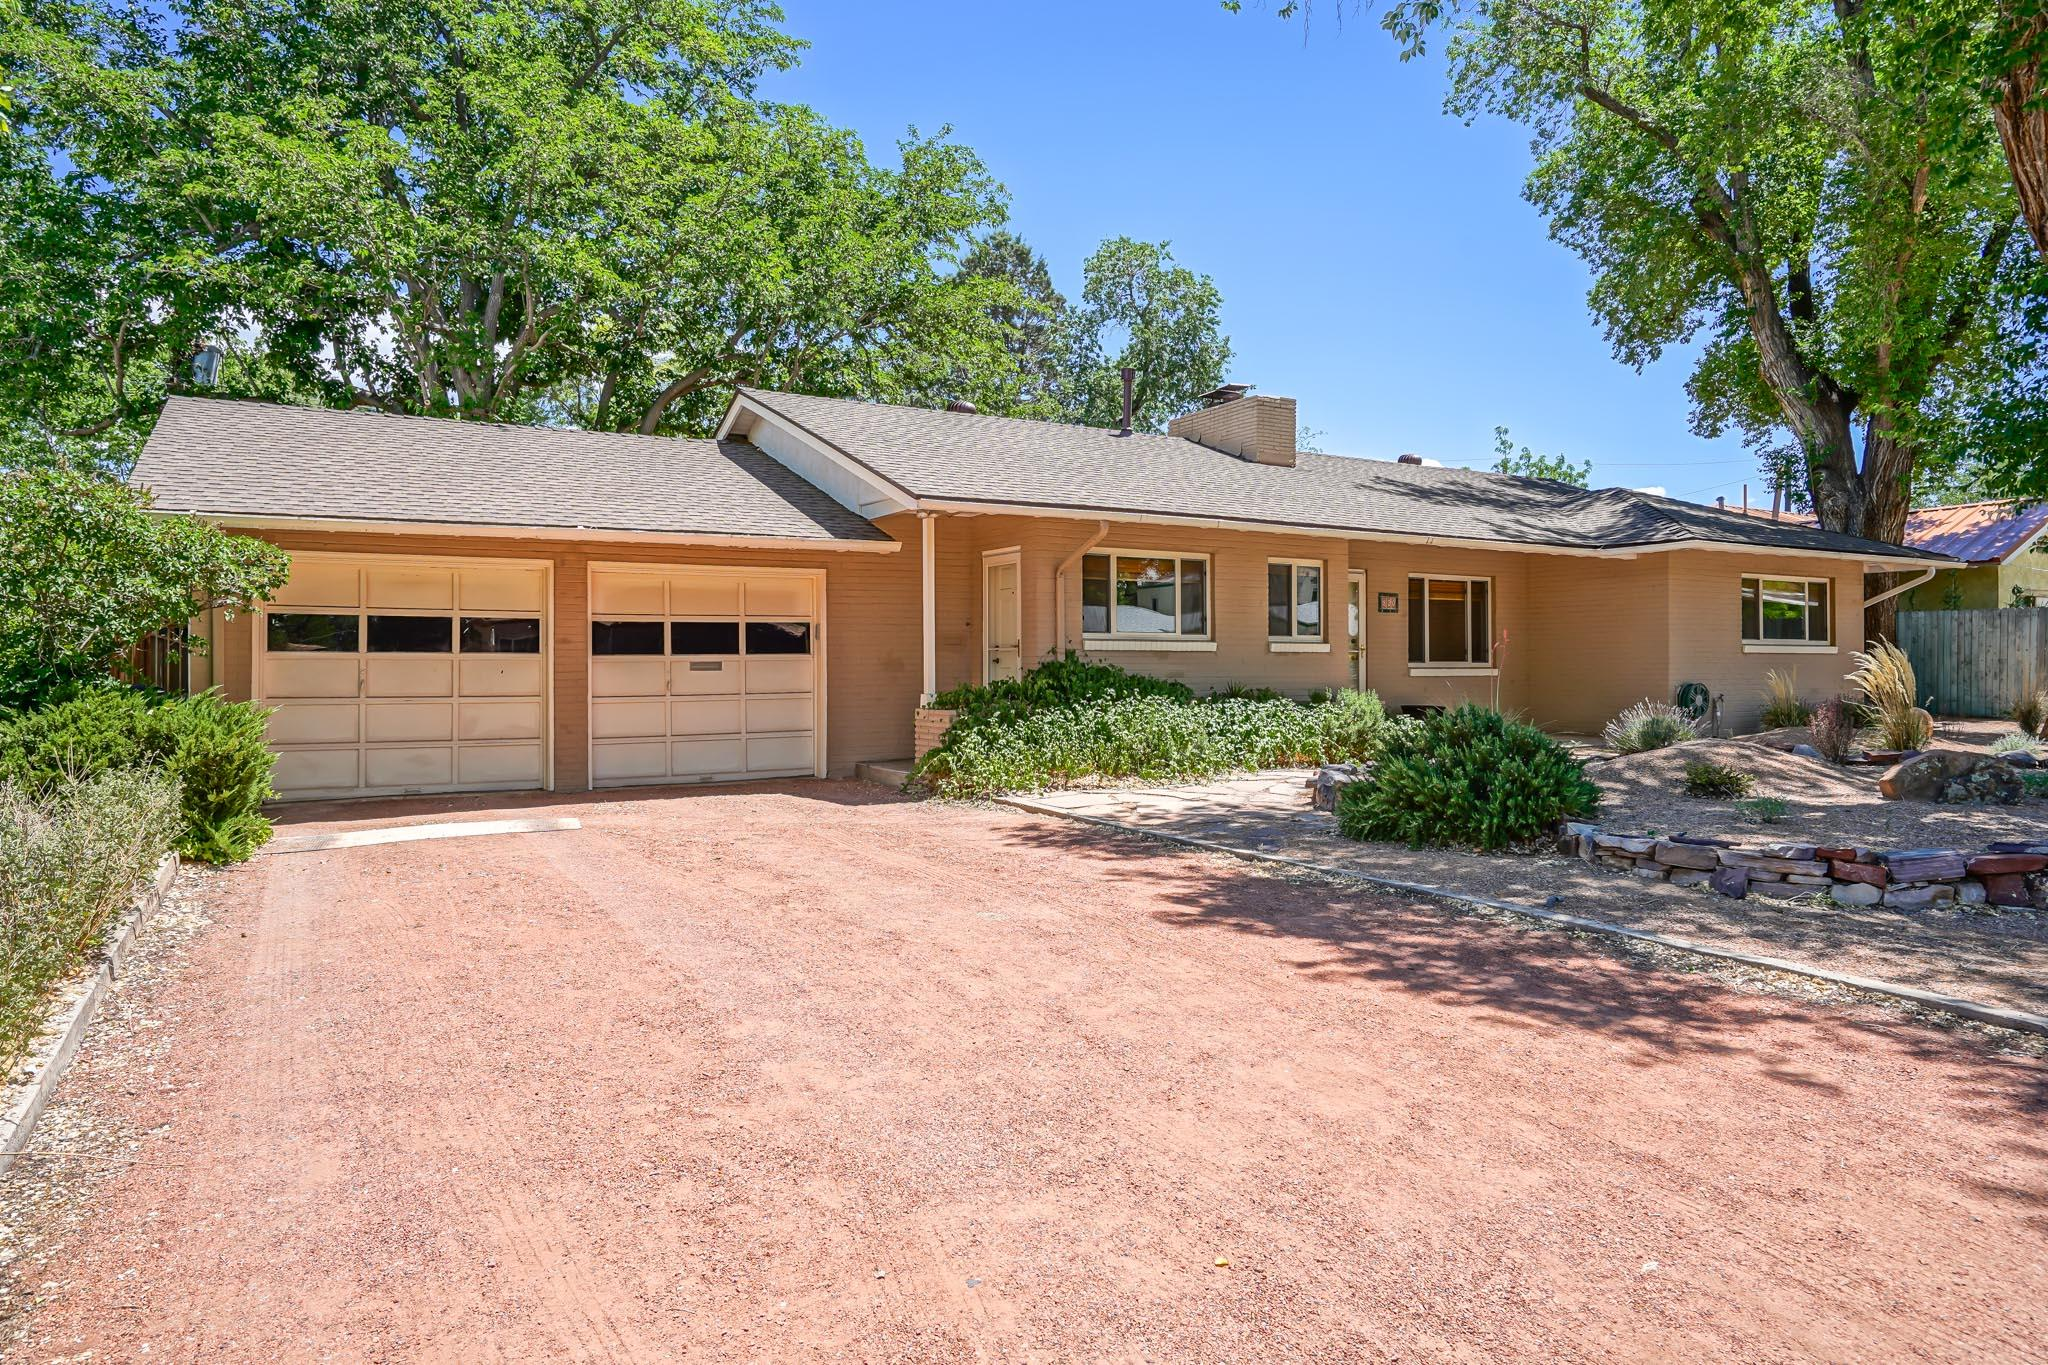 820 SOLANO Drive NE, Albuquerque, NM 87110 - Albuquerque, NM real estate listing